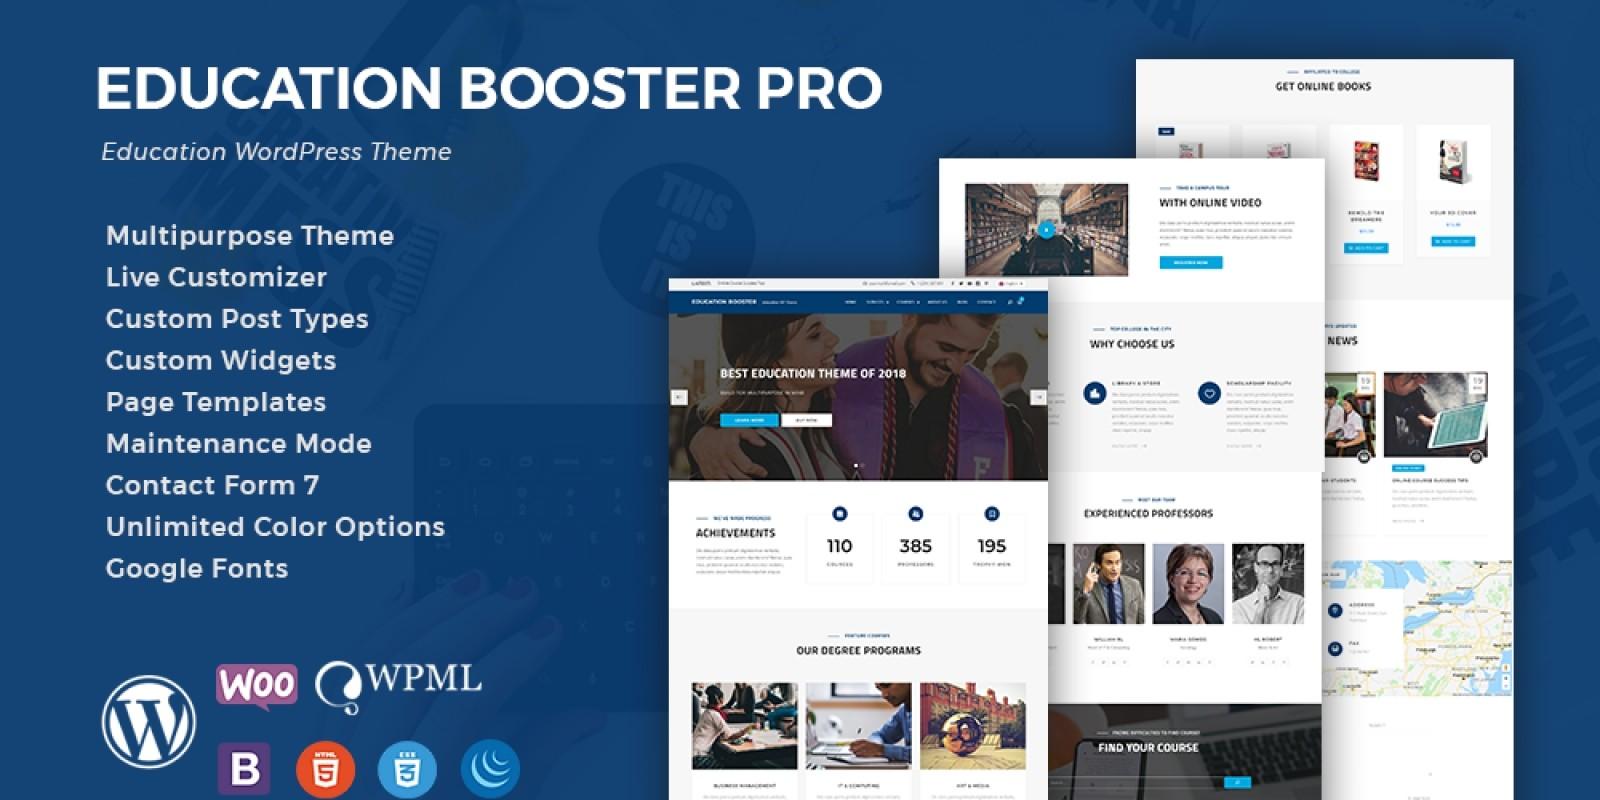 education booster pro wordpress theme by keonthemes